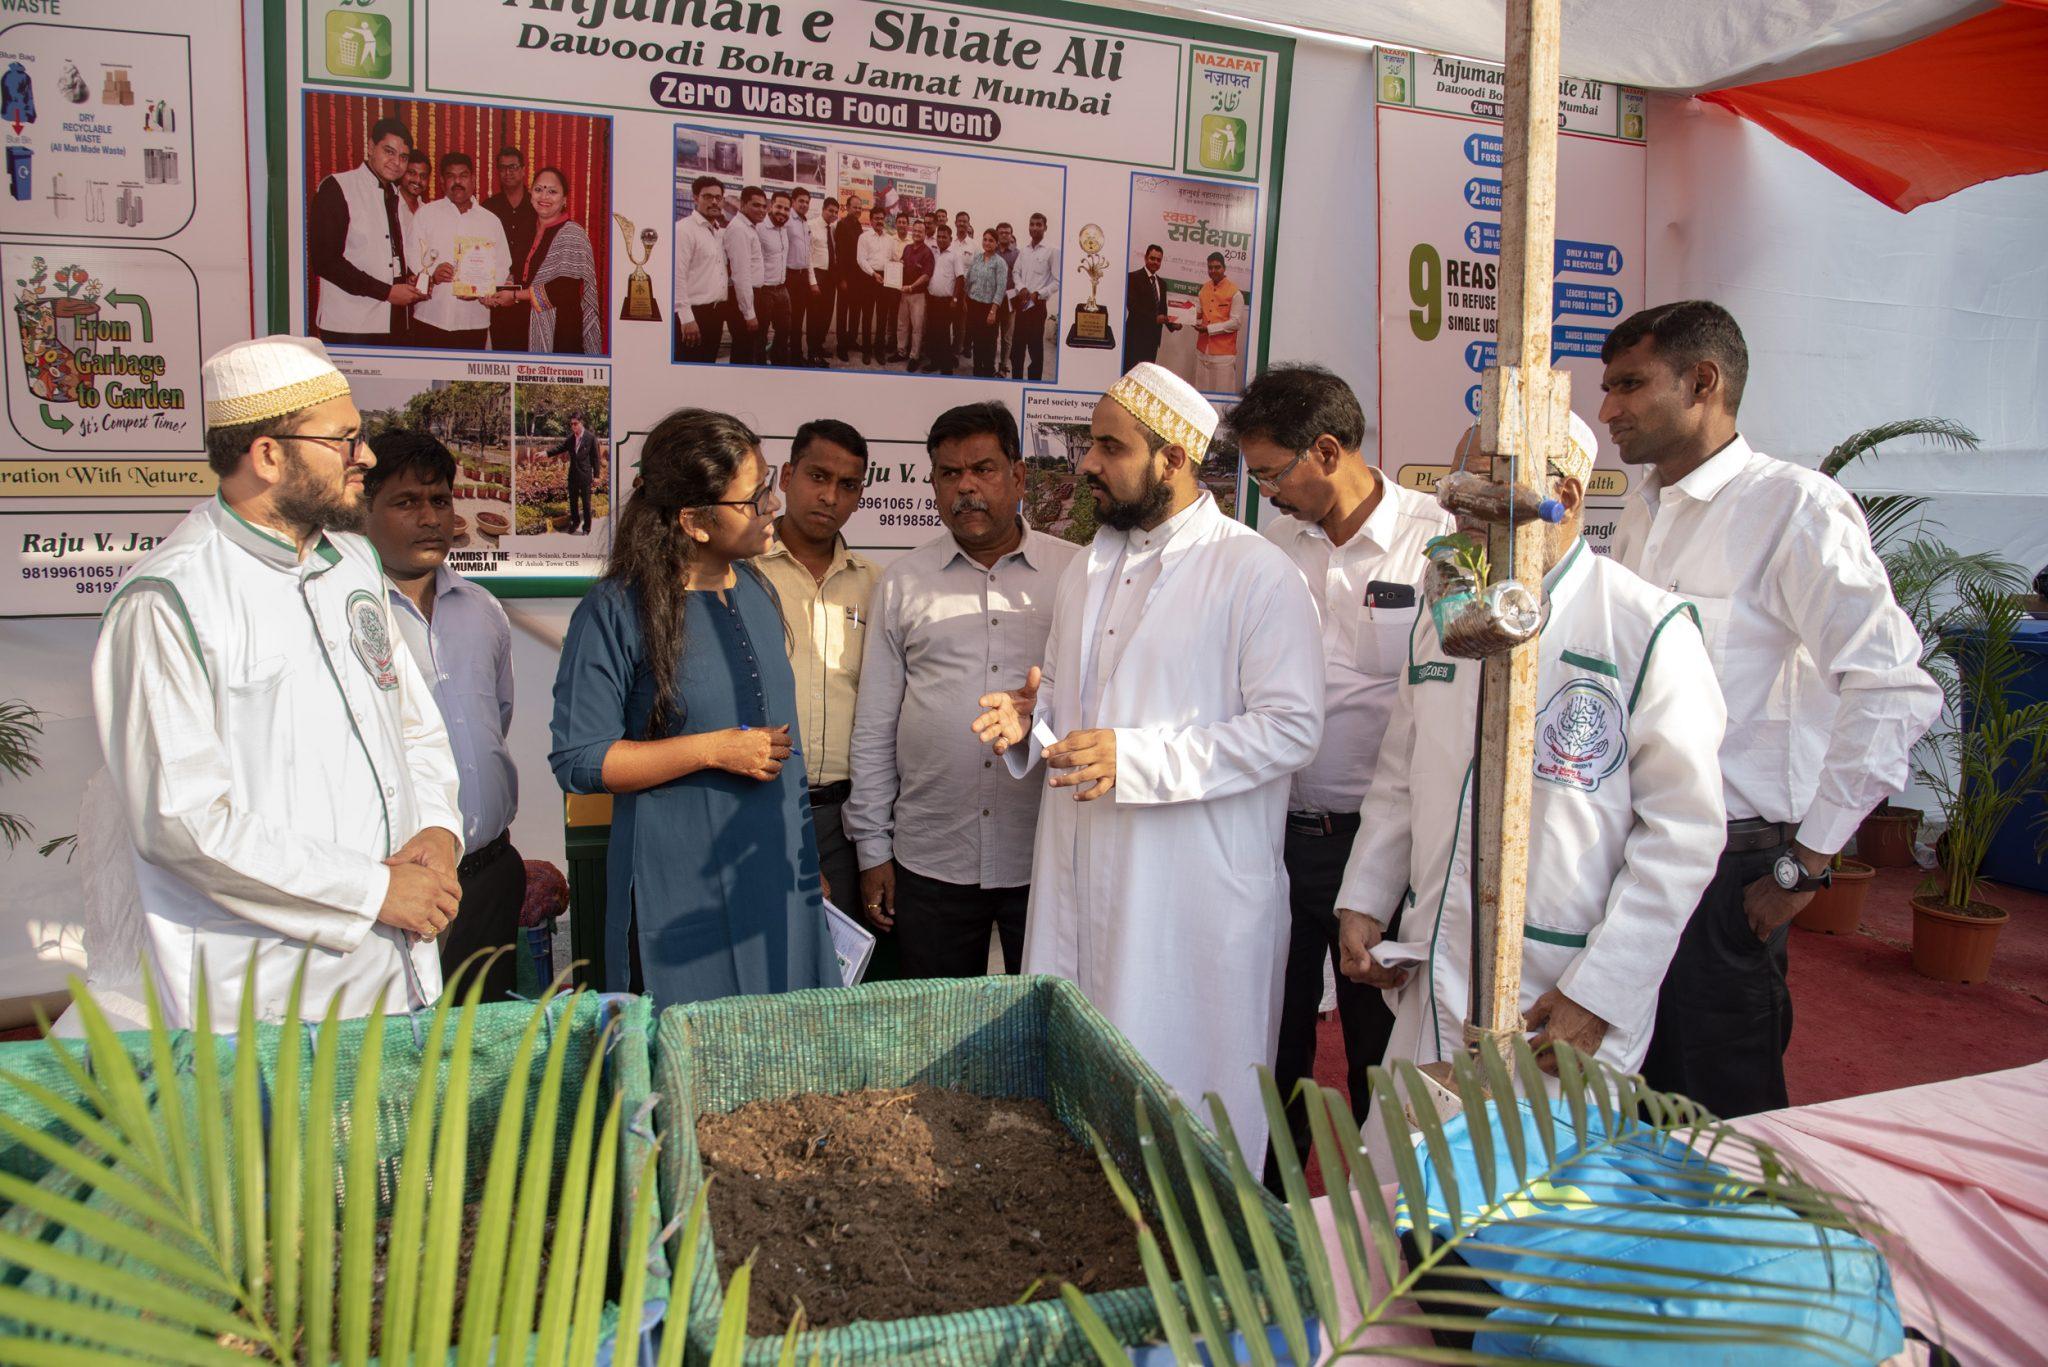 Mumbai, Zero Waste, Plastic Pollution, Turning the Tide, Plastic Pollution, Syedna Mohammed Burhanuddin, Syedna Mufaddal Saifuddin, Dawoodi Bohras